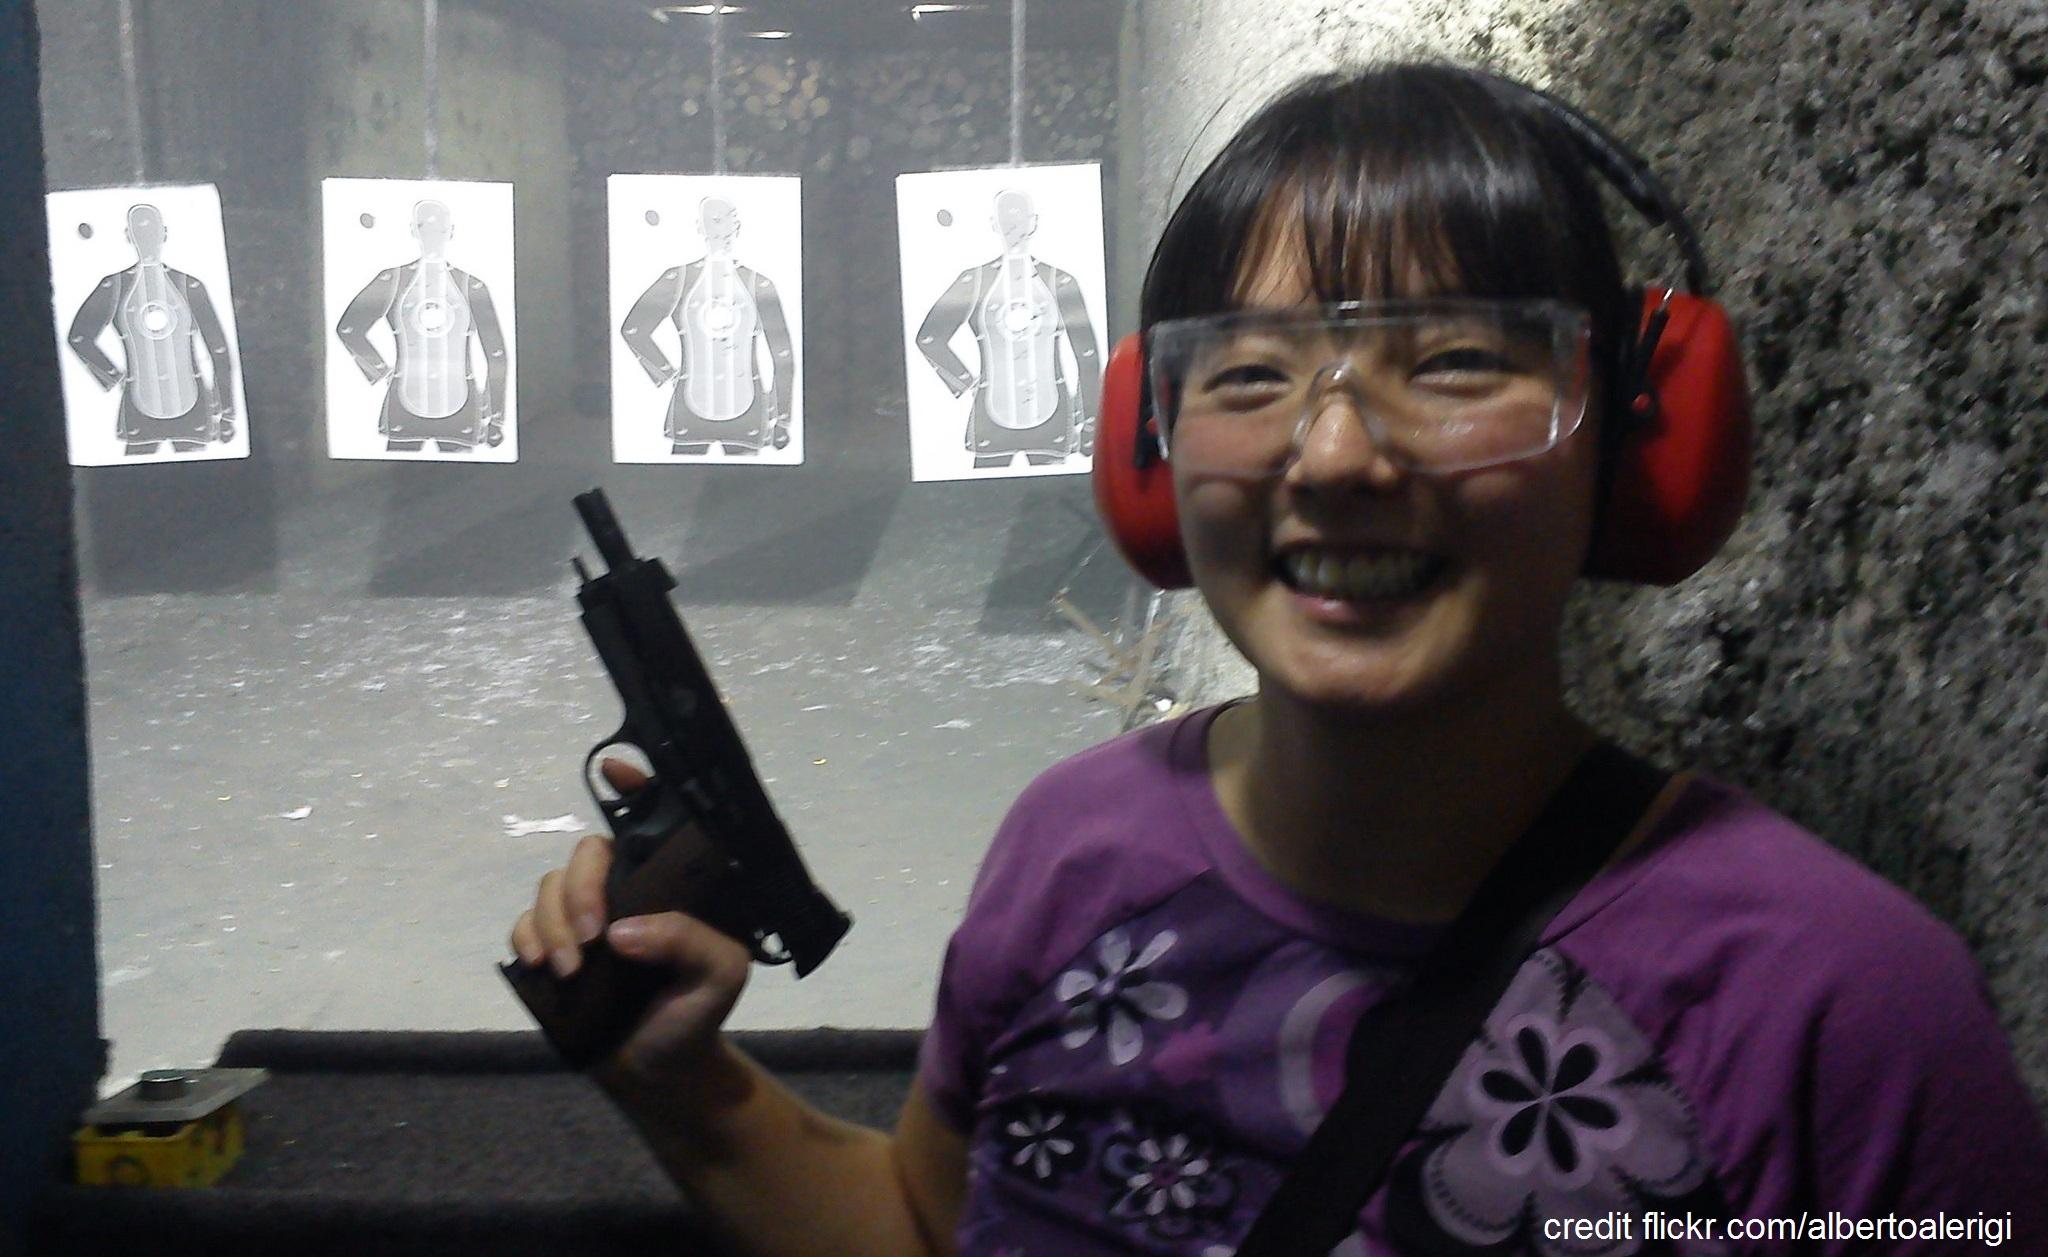 PPC Target shooting